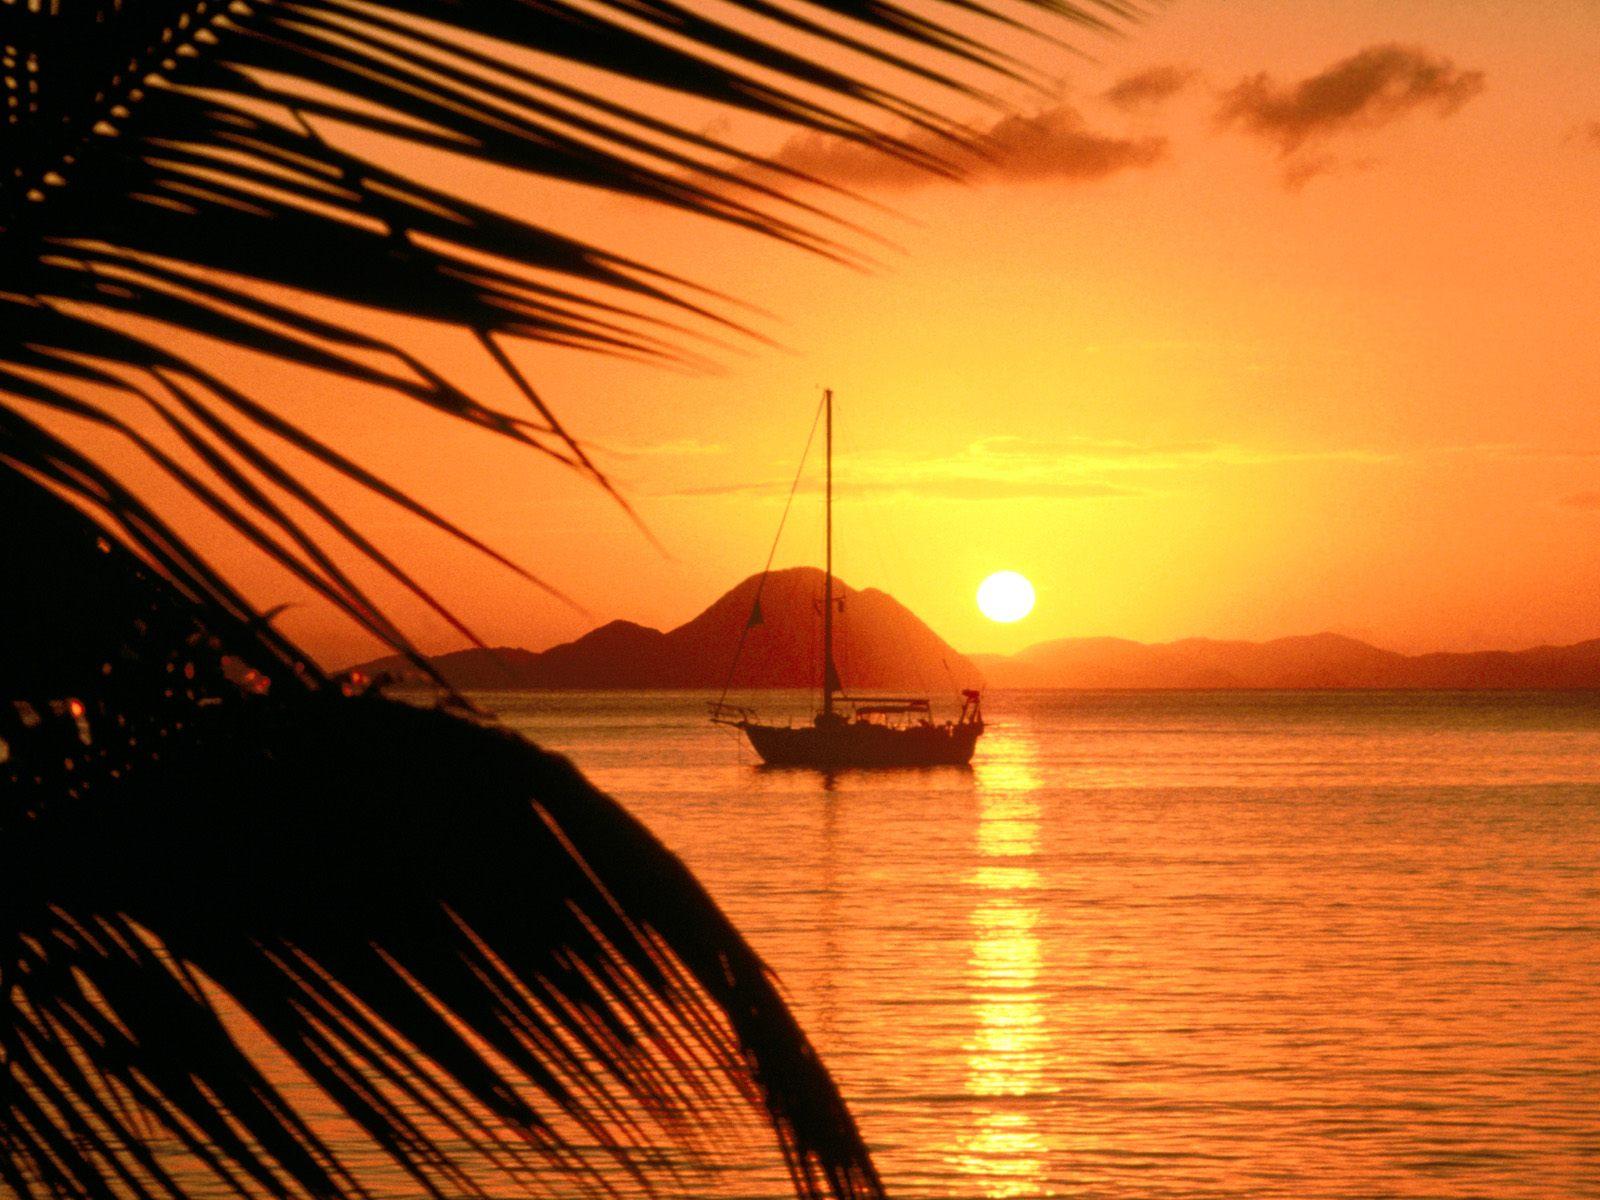 Boat Great Sunset Photos Make You Smile 274482 Wallpaper wallpaper